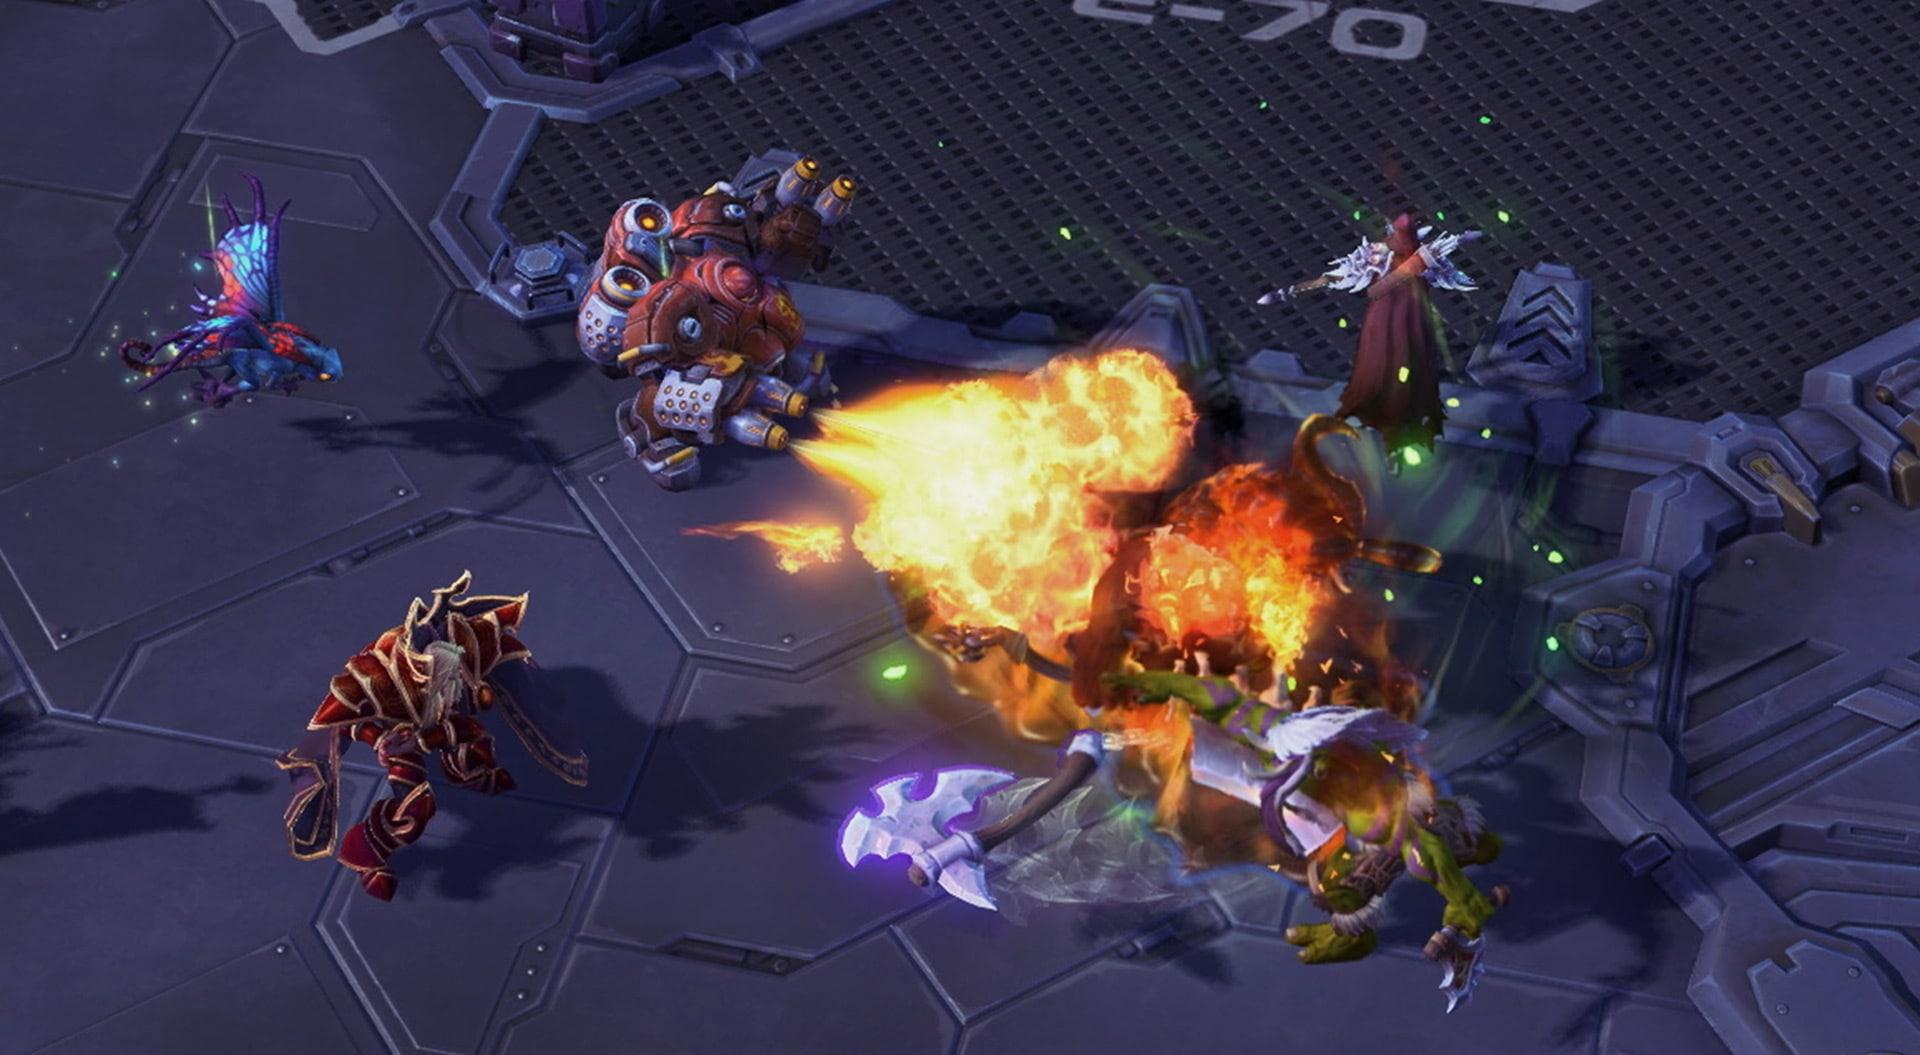 Blaze_Gameplay_Basic_Attack.jpg